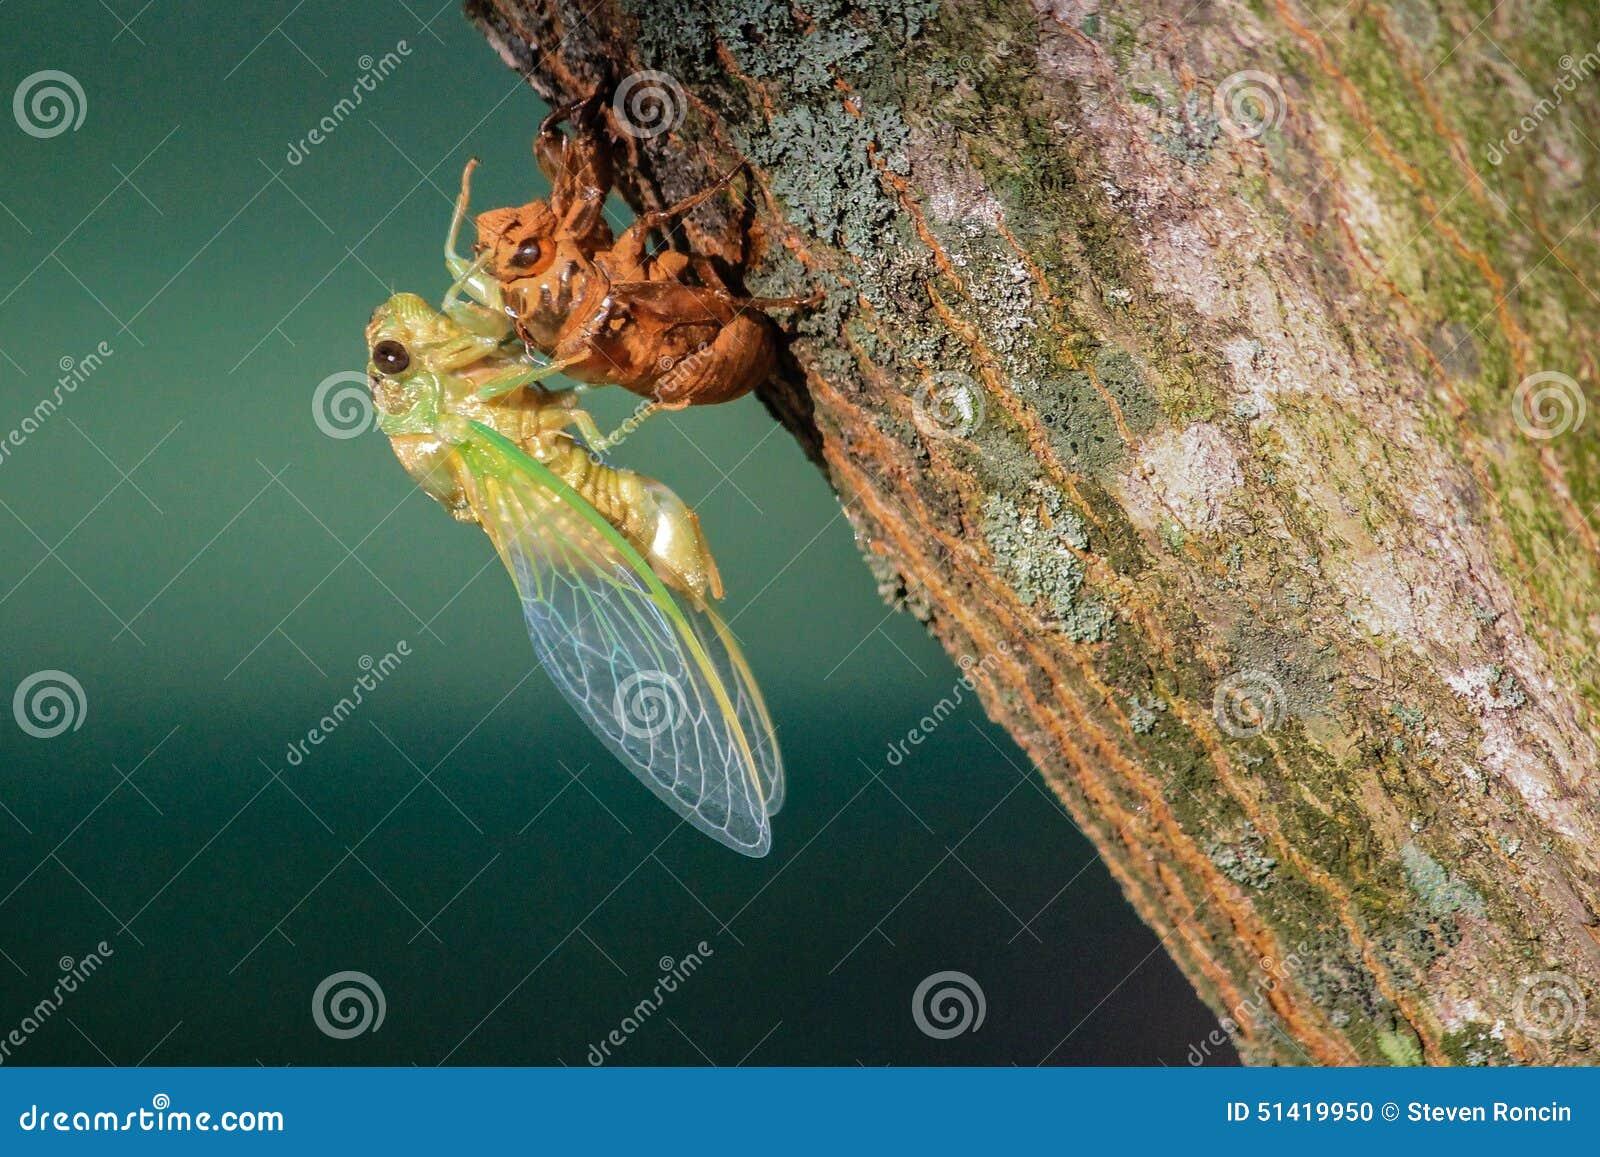 Cicada το έντομο ολοκληρώνει τη μεταμόρφωση στο φτερωτό ενήλικο